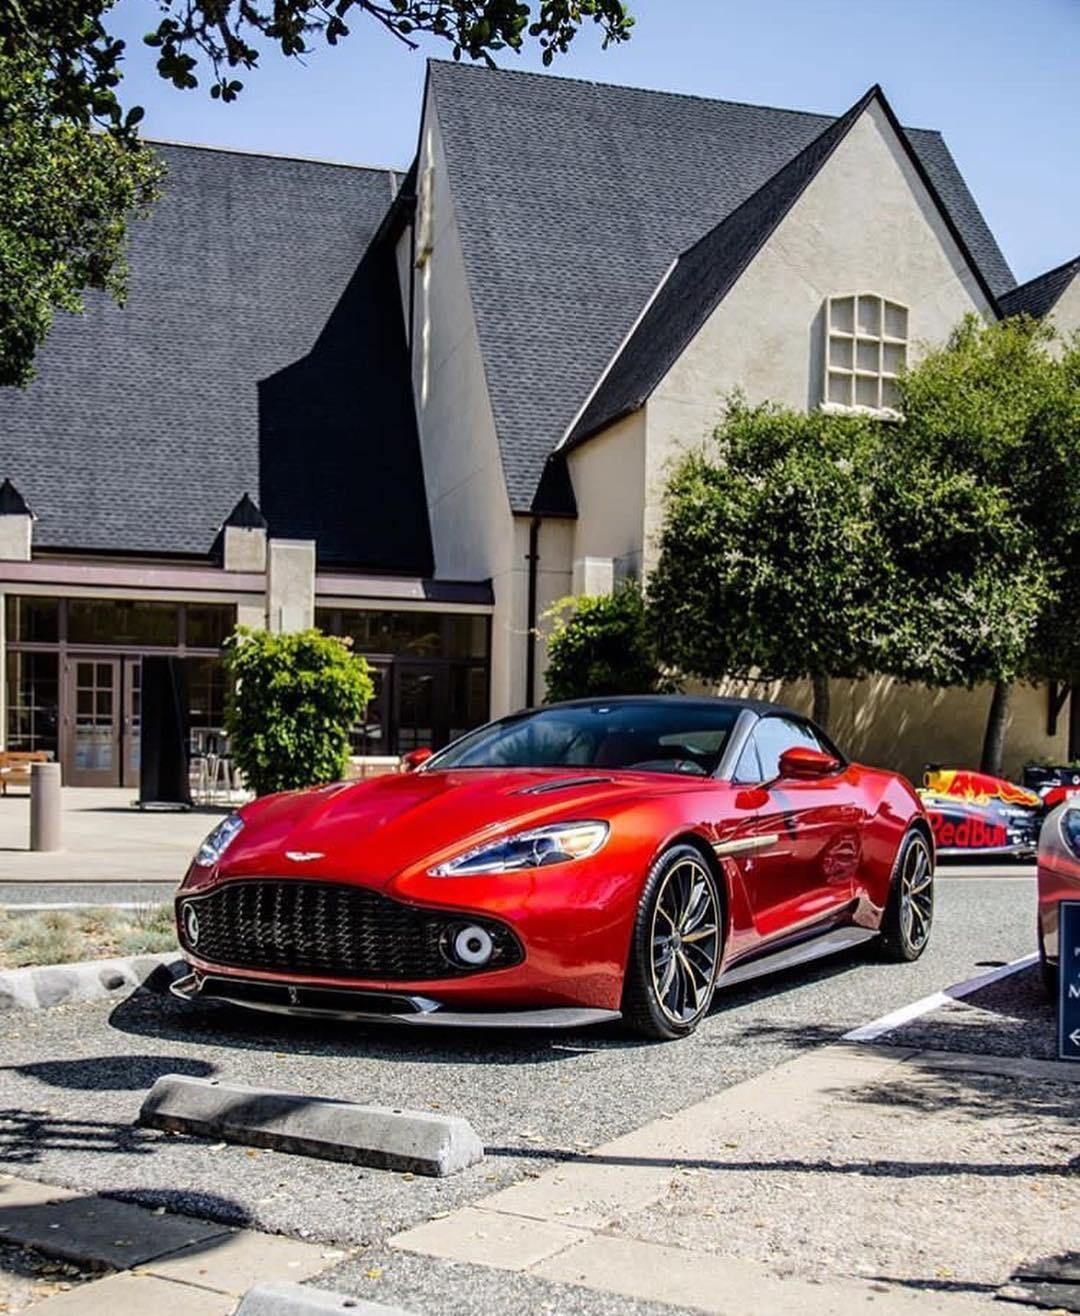 25 Inspirational Luxury Car Photo S Luxury Car Photos Best Luxury Sports Car Bugatti Cars